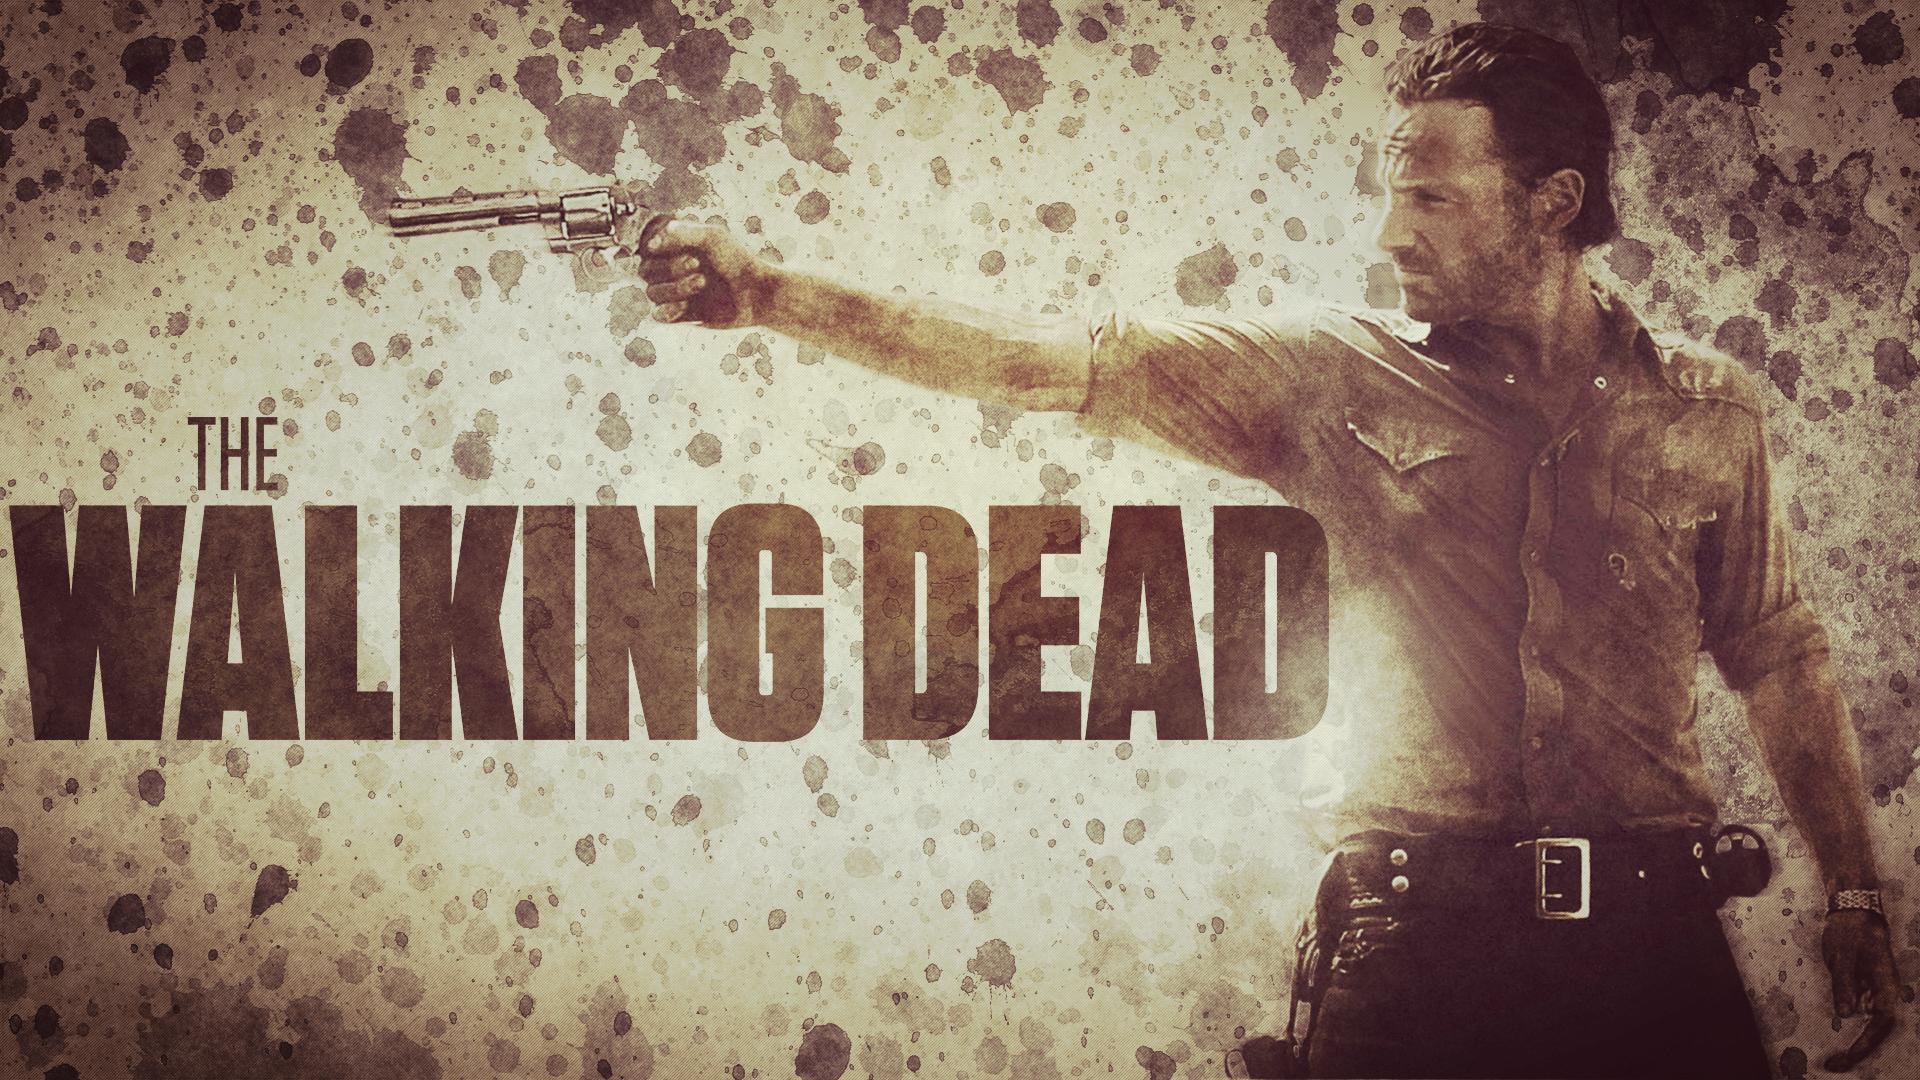 The Walking Dead Rick Grimes By Mennisian Deviantart Com On